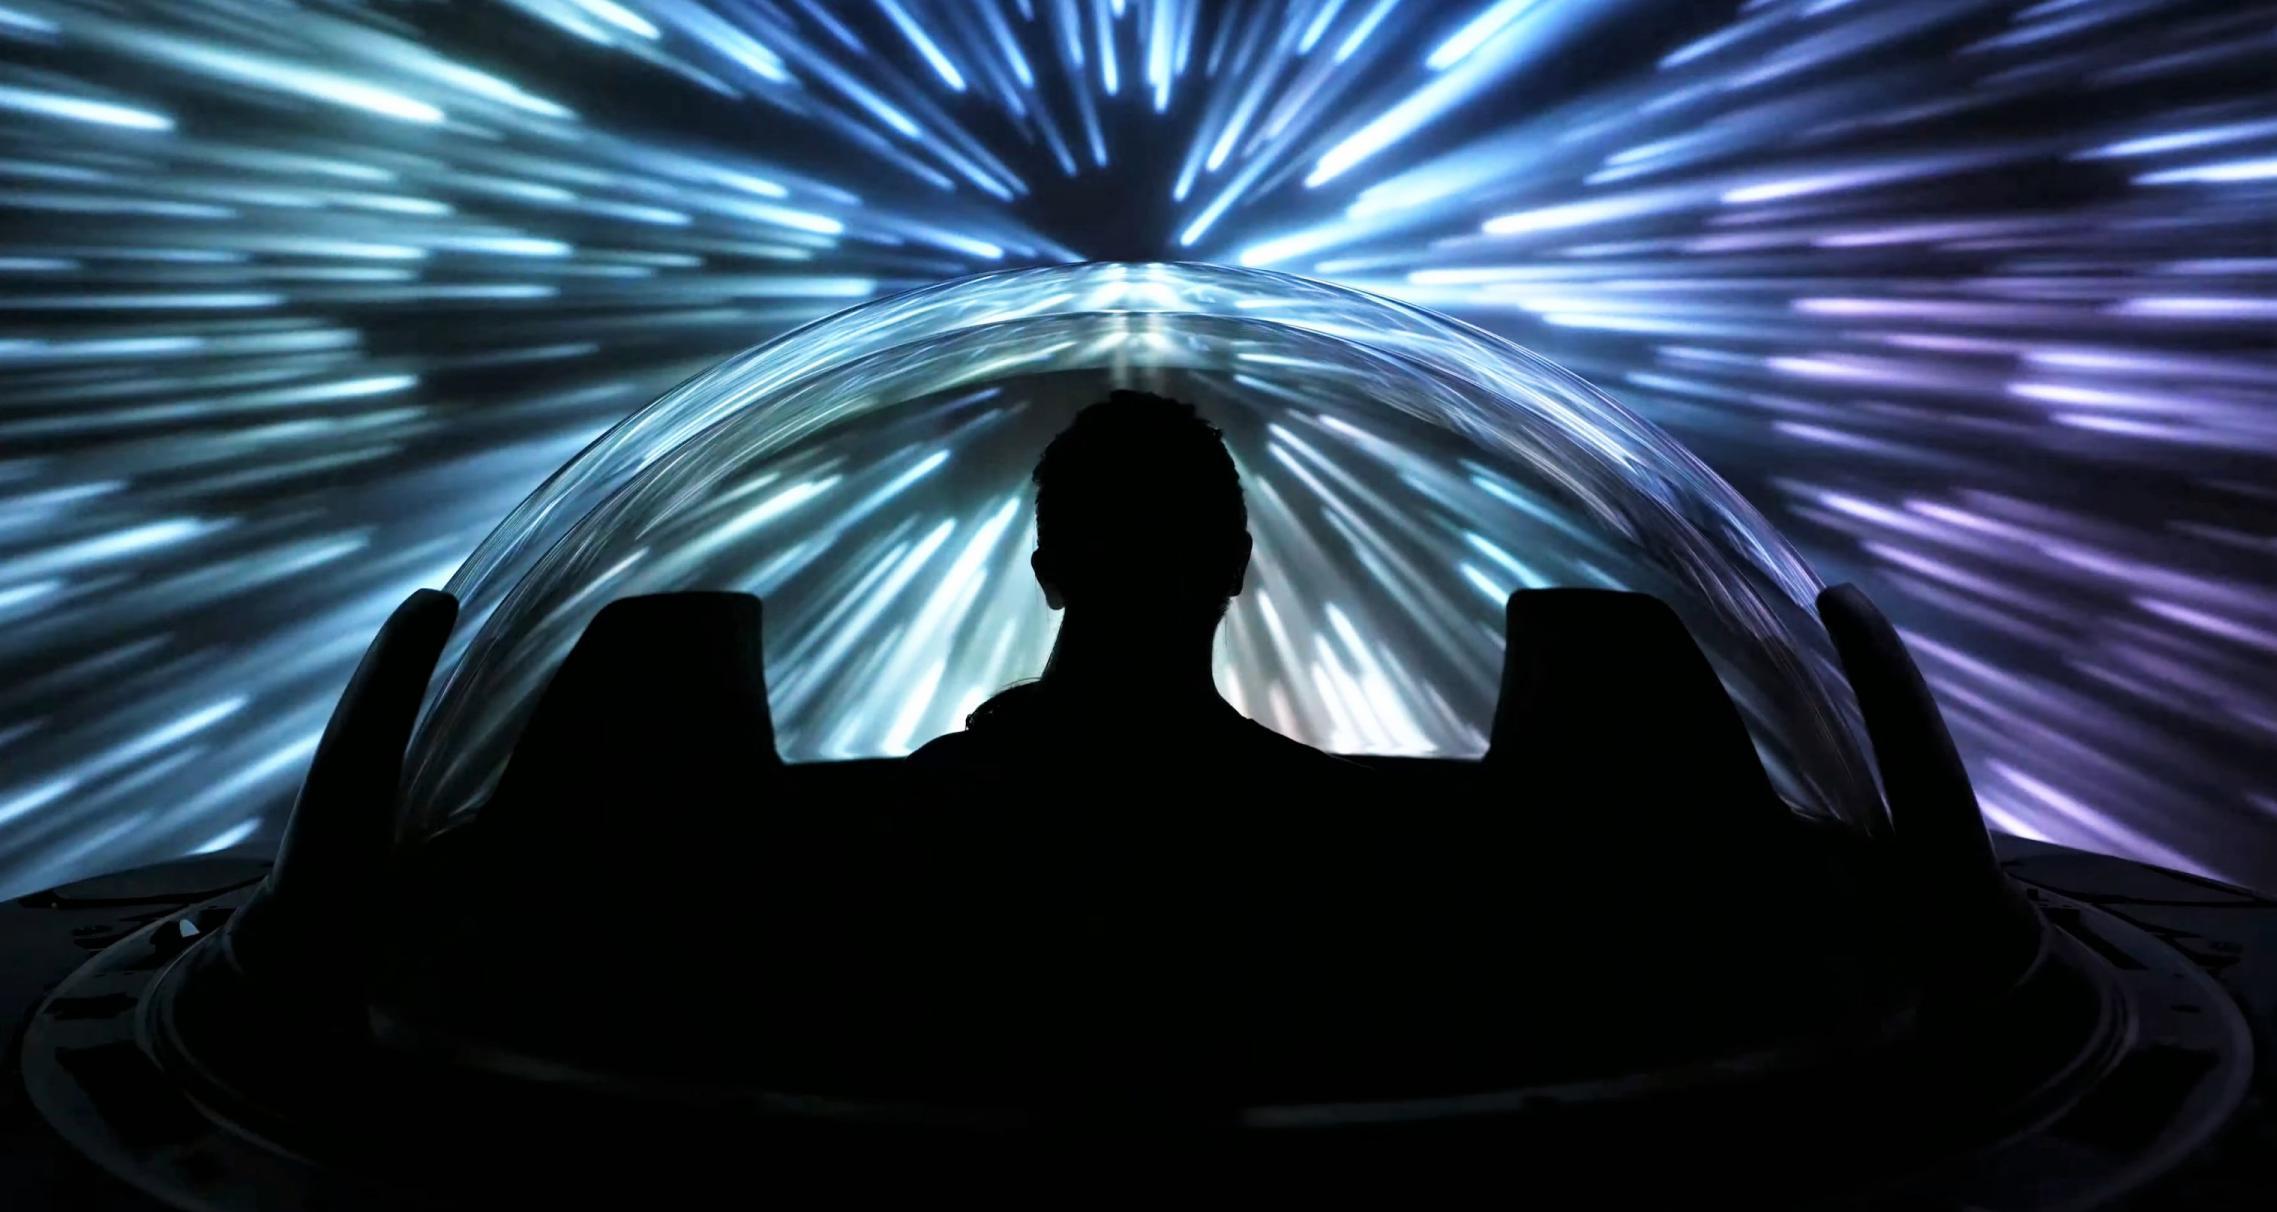 Inspiration4 Dragon C207 F9 B1062 091521 webcast (SpaceX) cupola 1 (c)